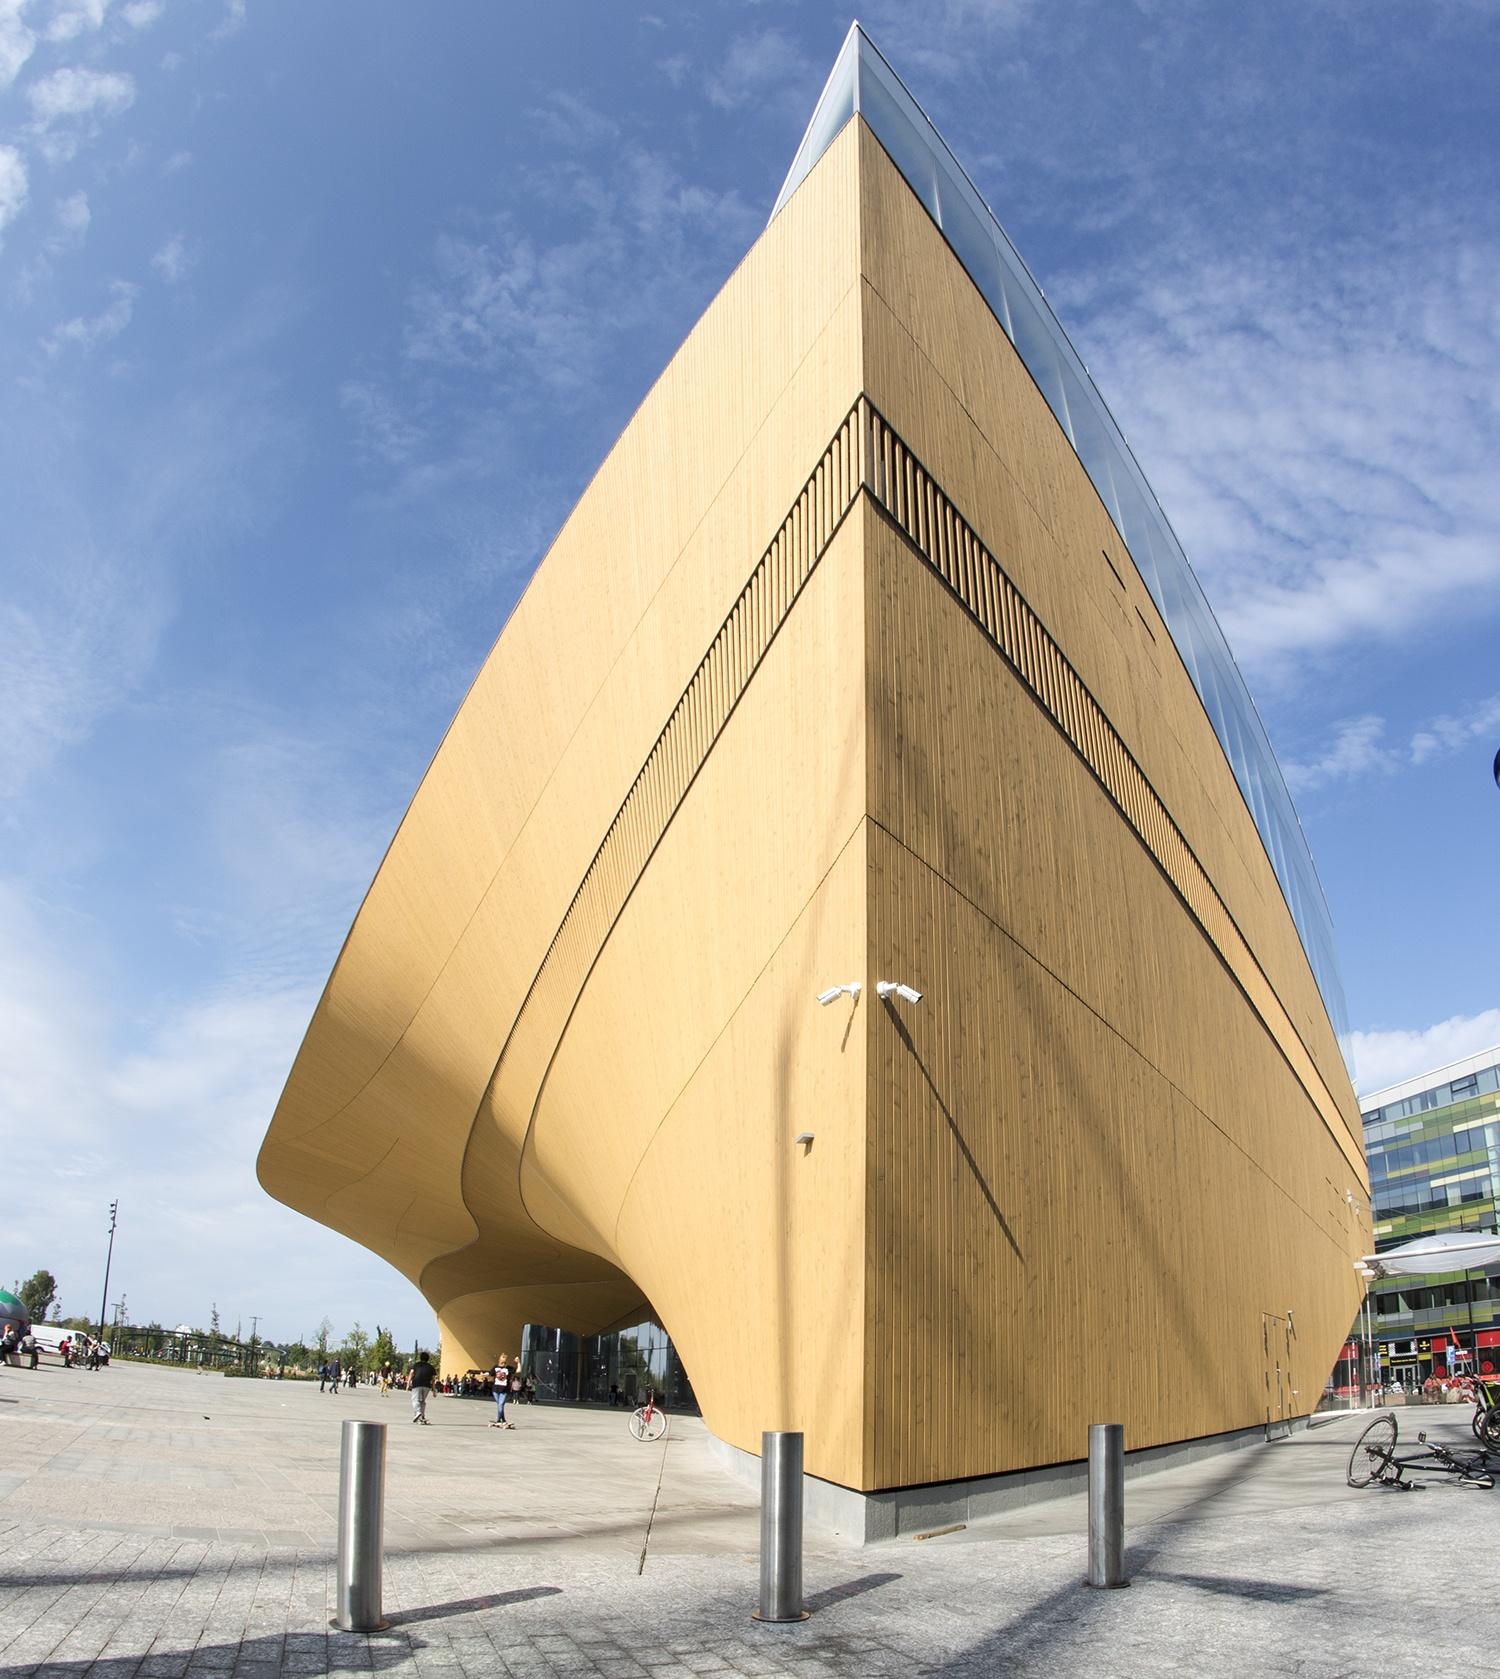 The Oodi library of Helsinki